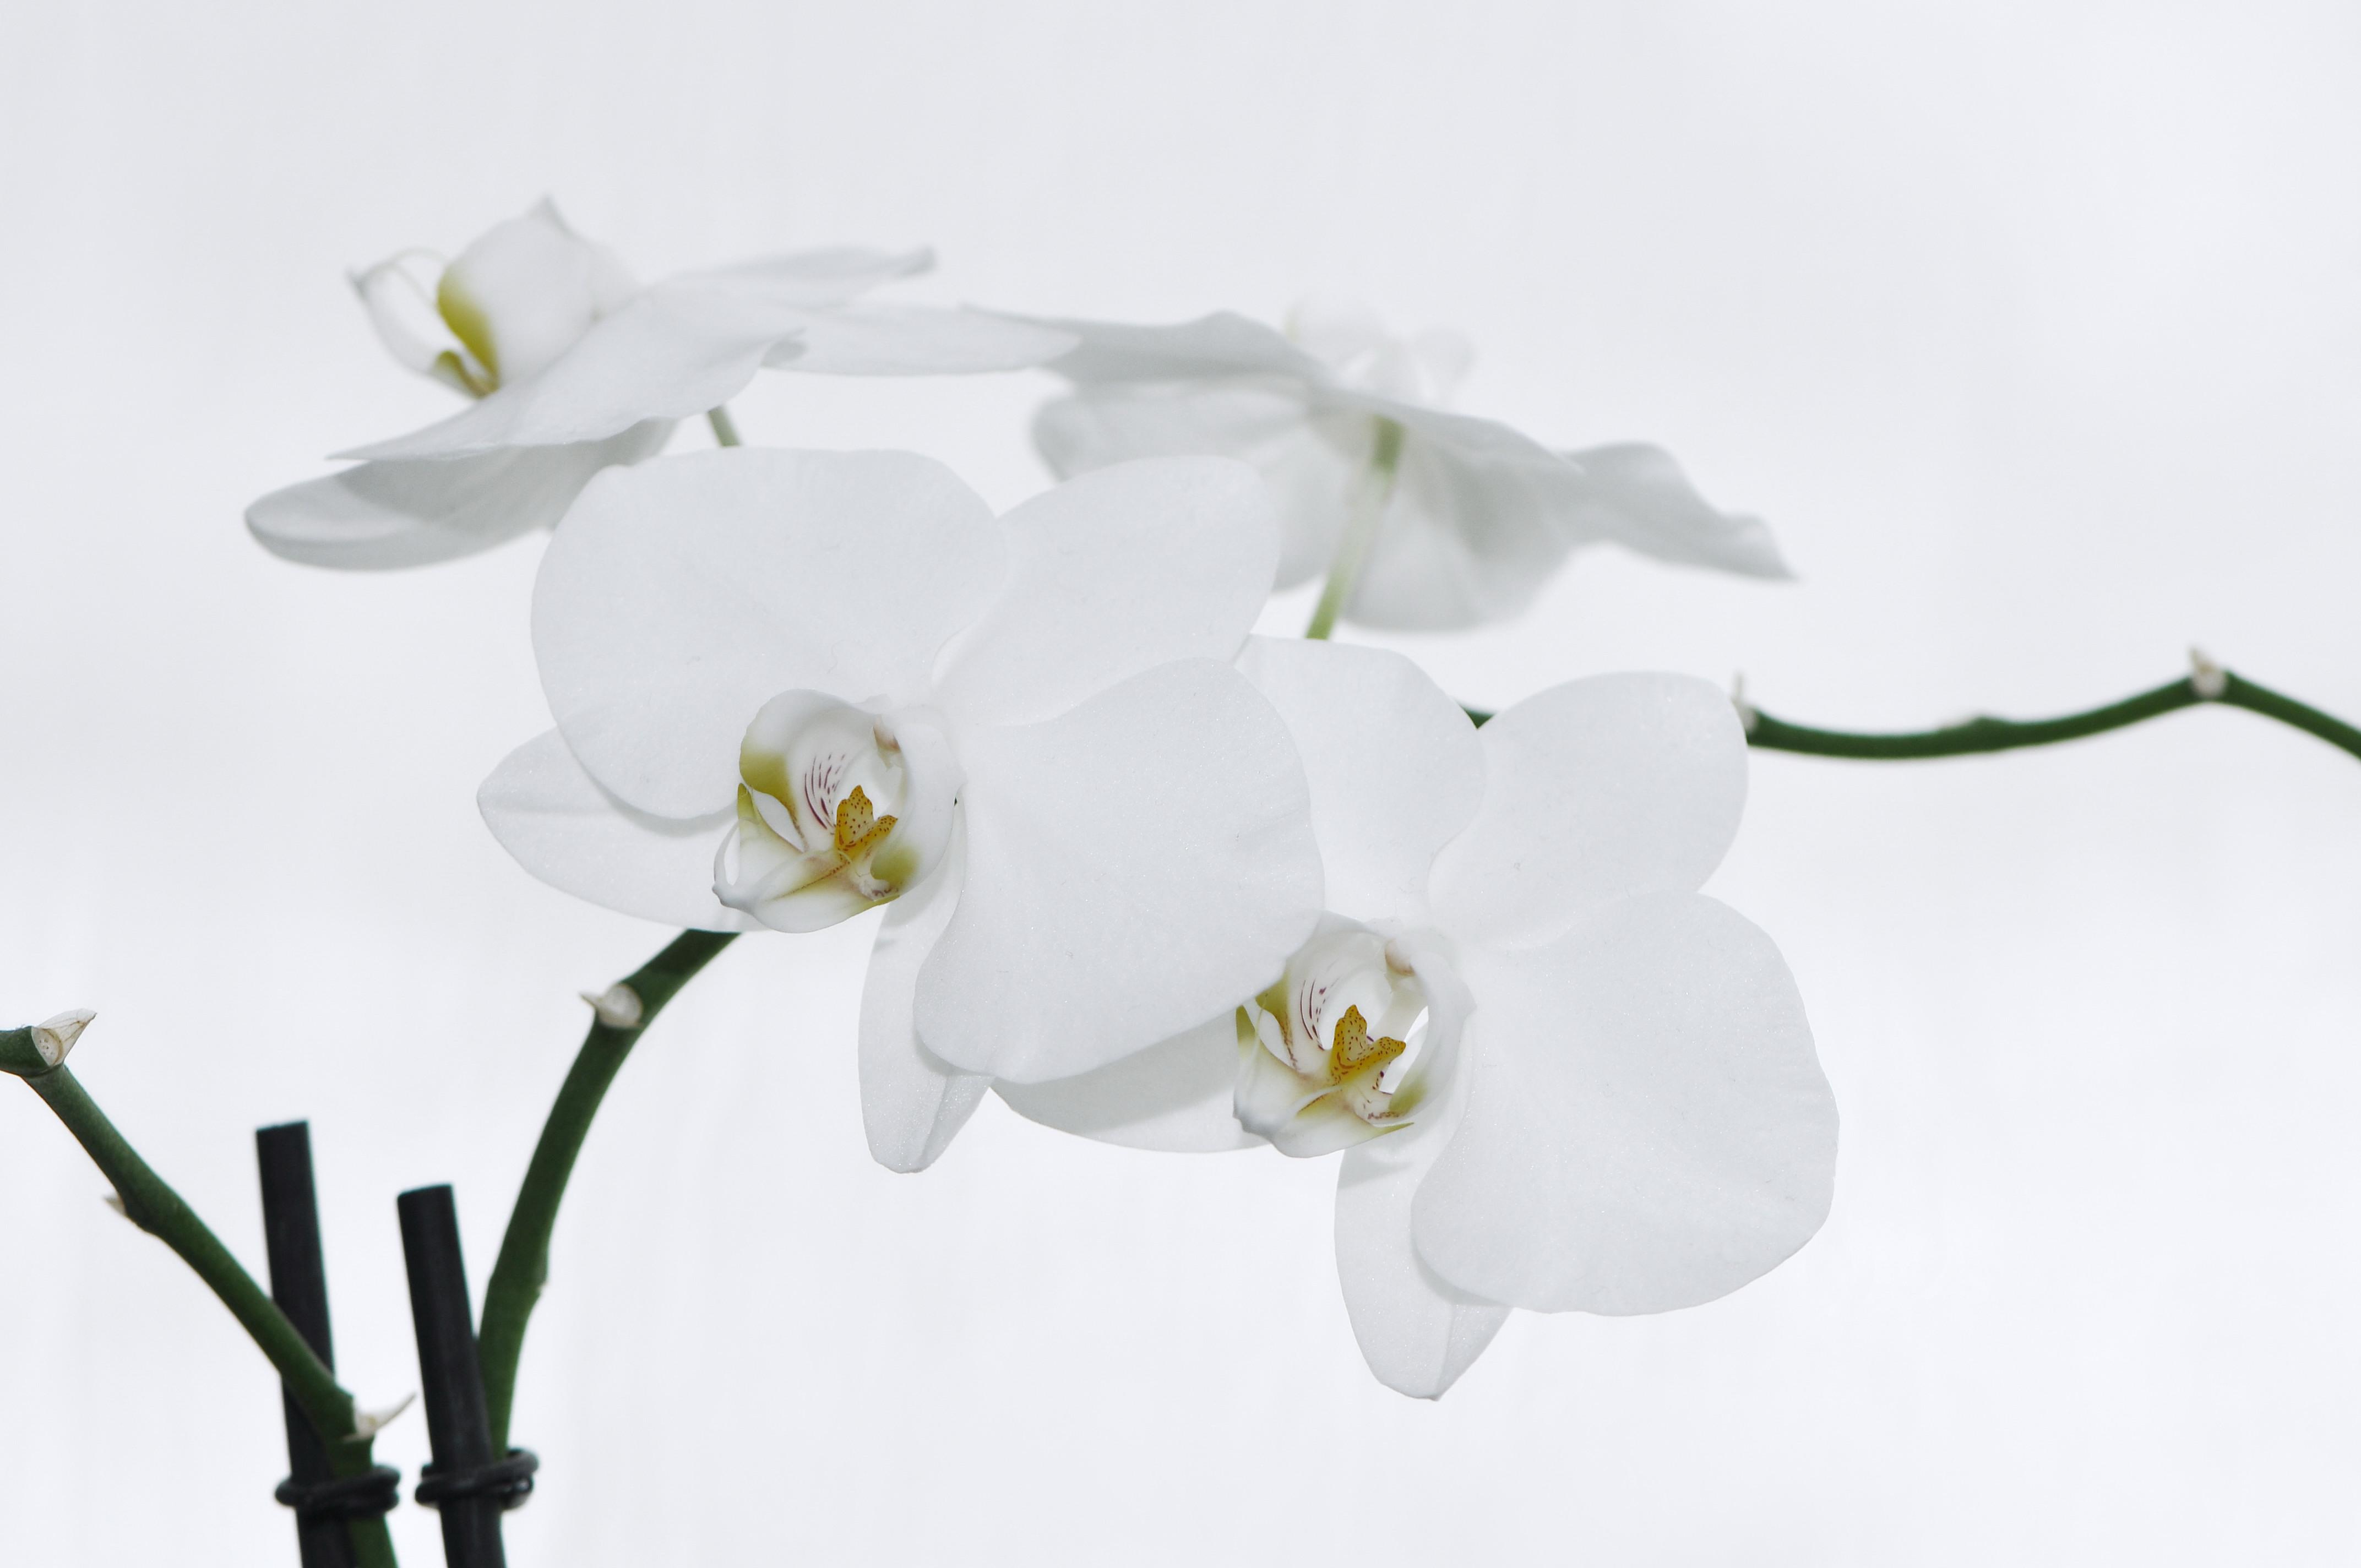 file nachtfalter orchidee phalaenopsis 11 jpg. Black Bedroom Furniture Sets. Home Design Ideas